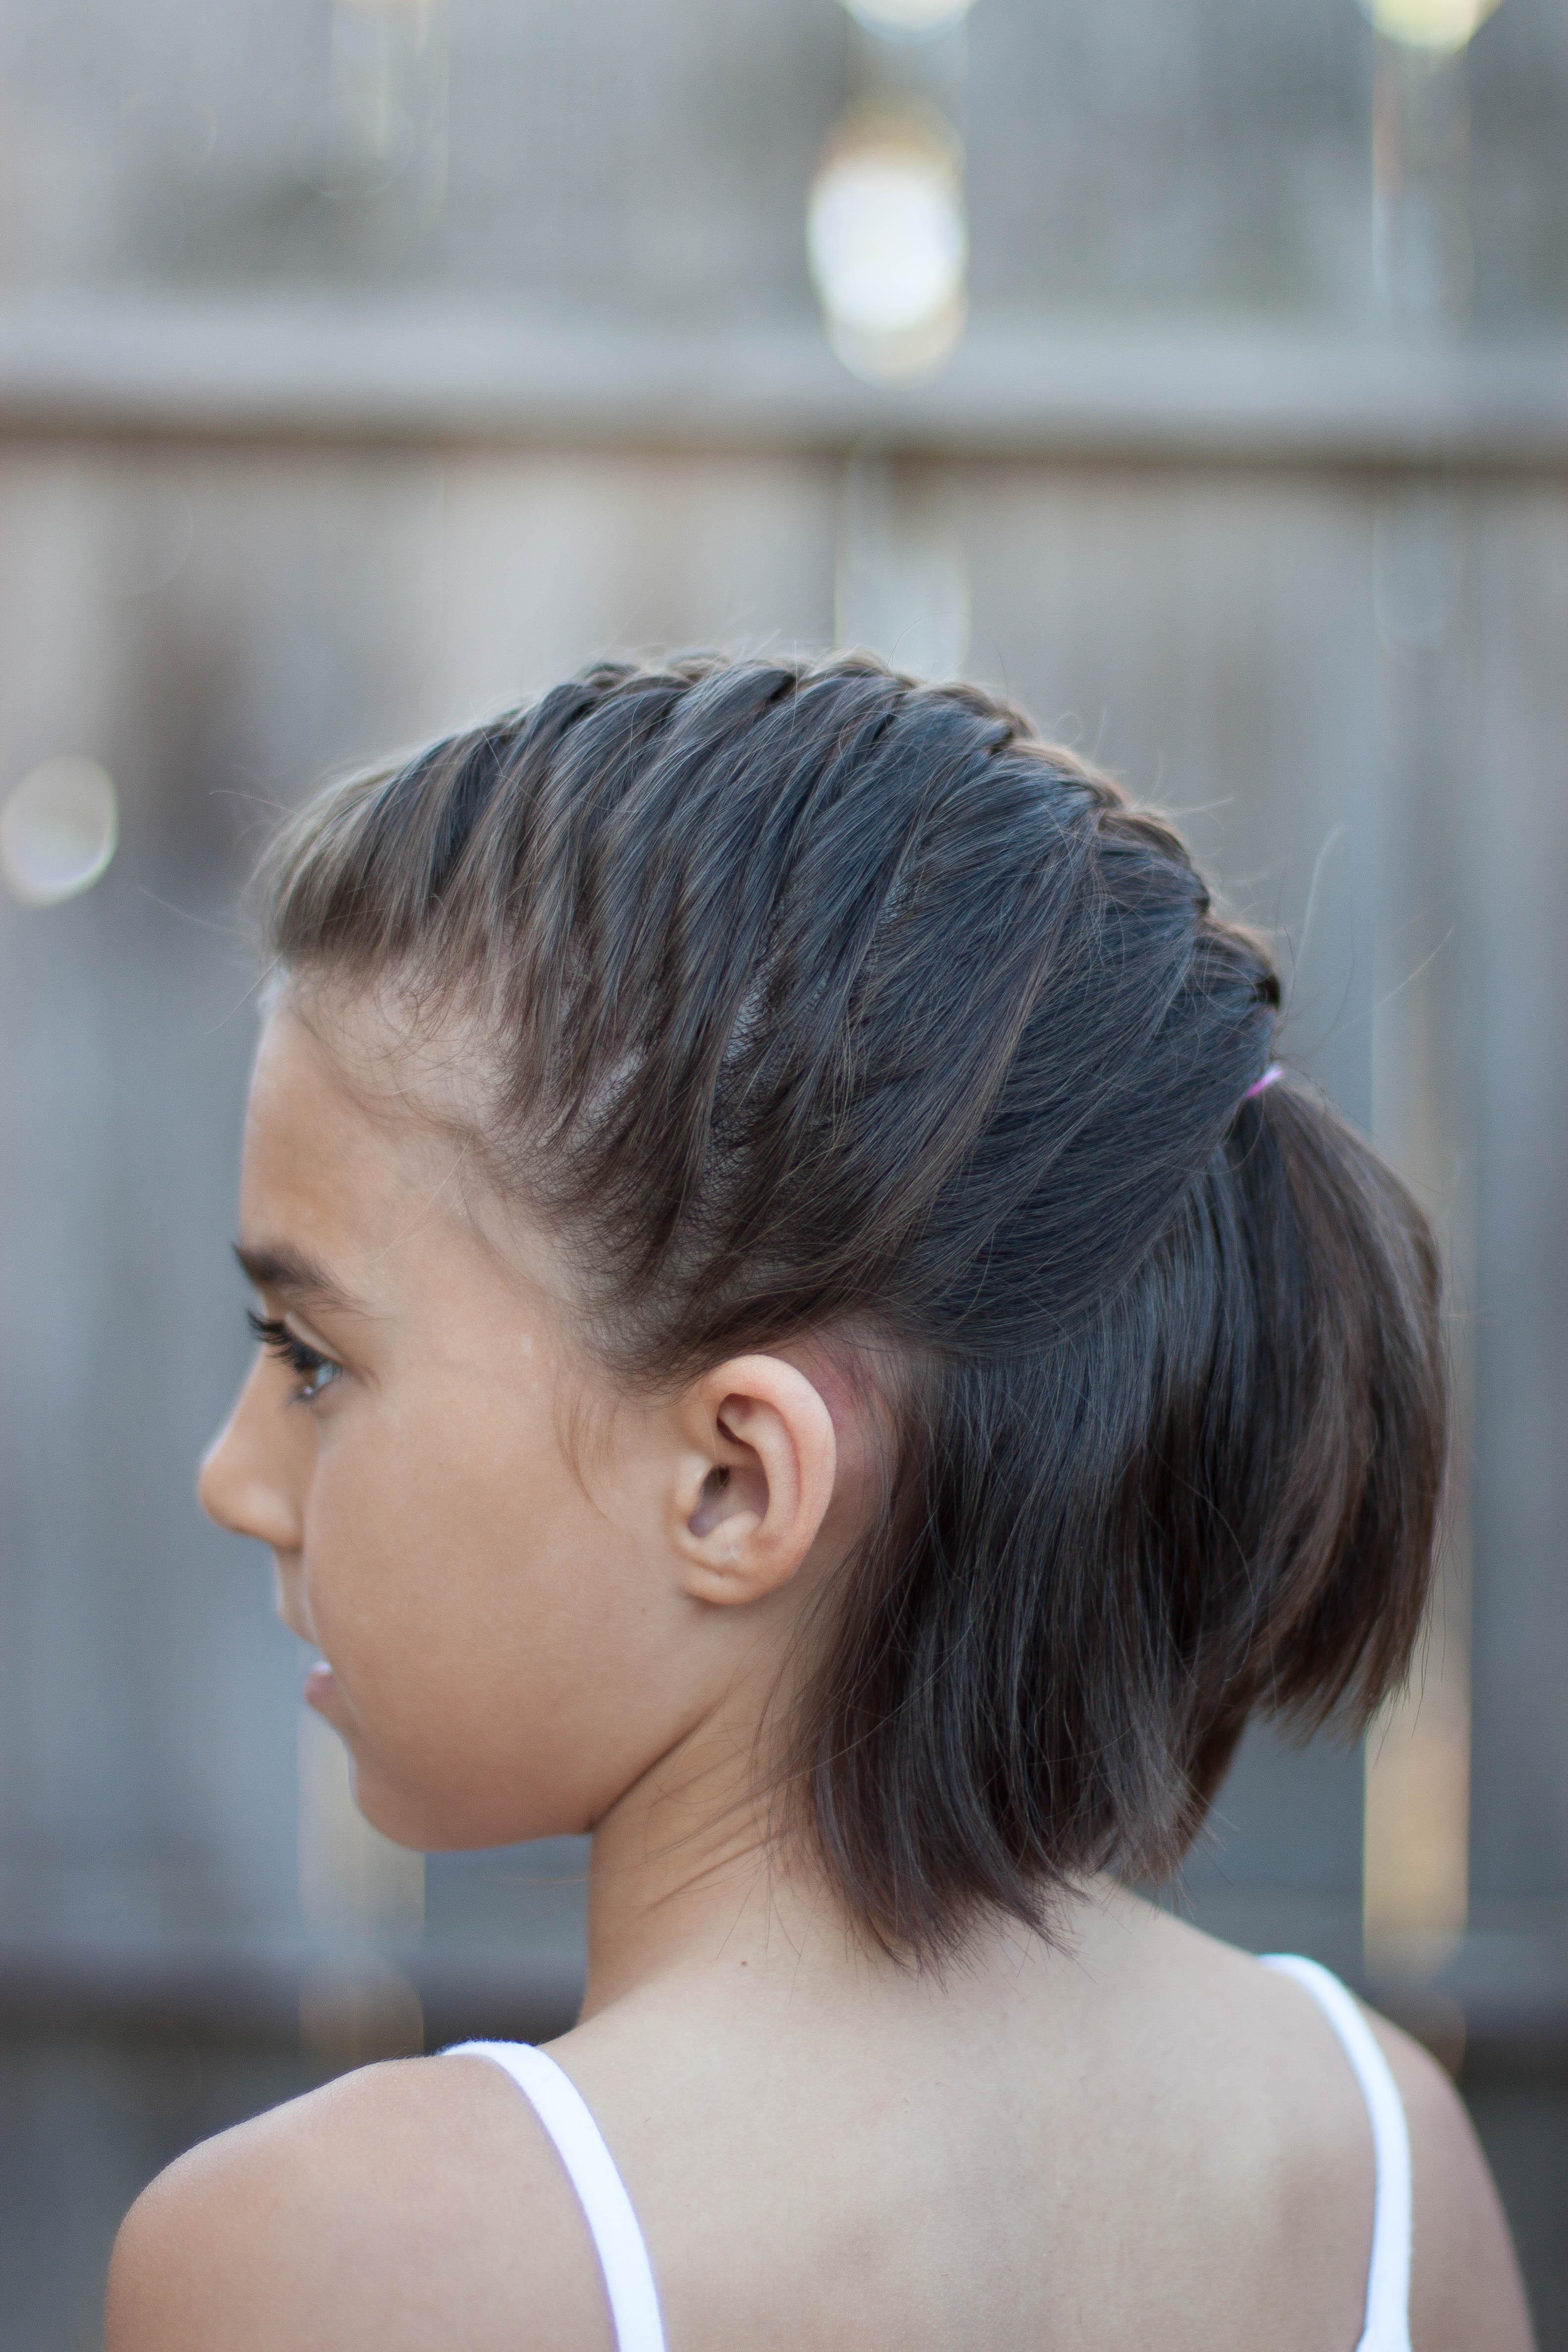 5 Braids For Short Hair | Cute Girls Hairstyles Pertaining To Cool Hairstyles For Short Hair Girl (View 12 of 25)